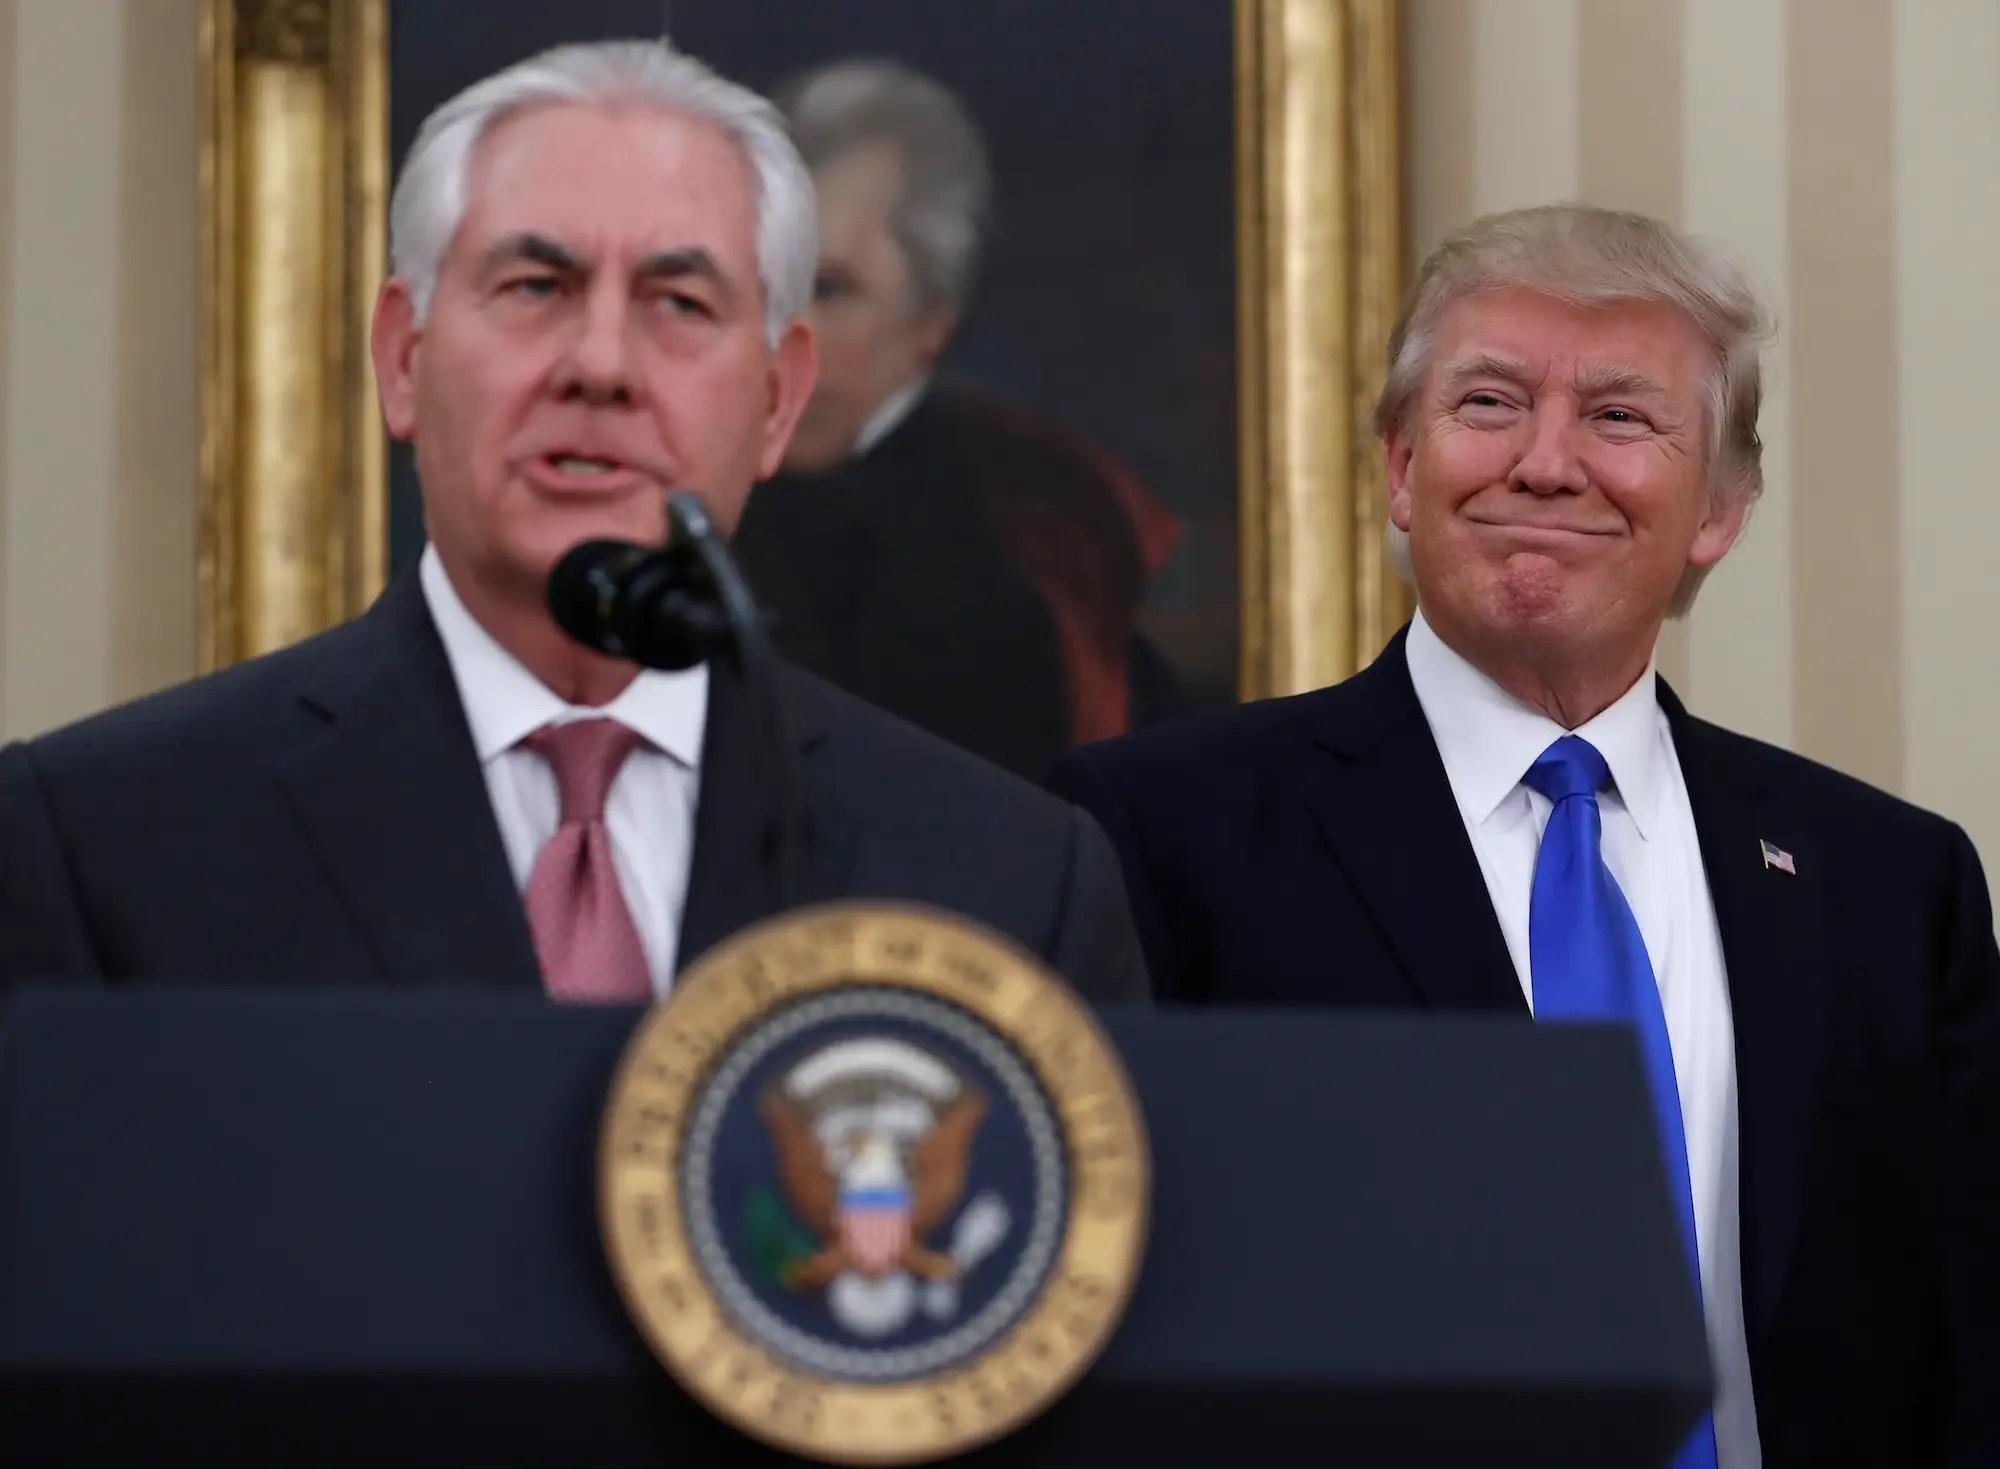 Presidential memorandum, March 20: Delegating to Tillerson